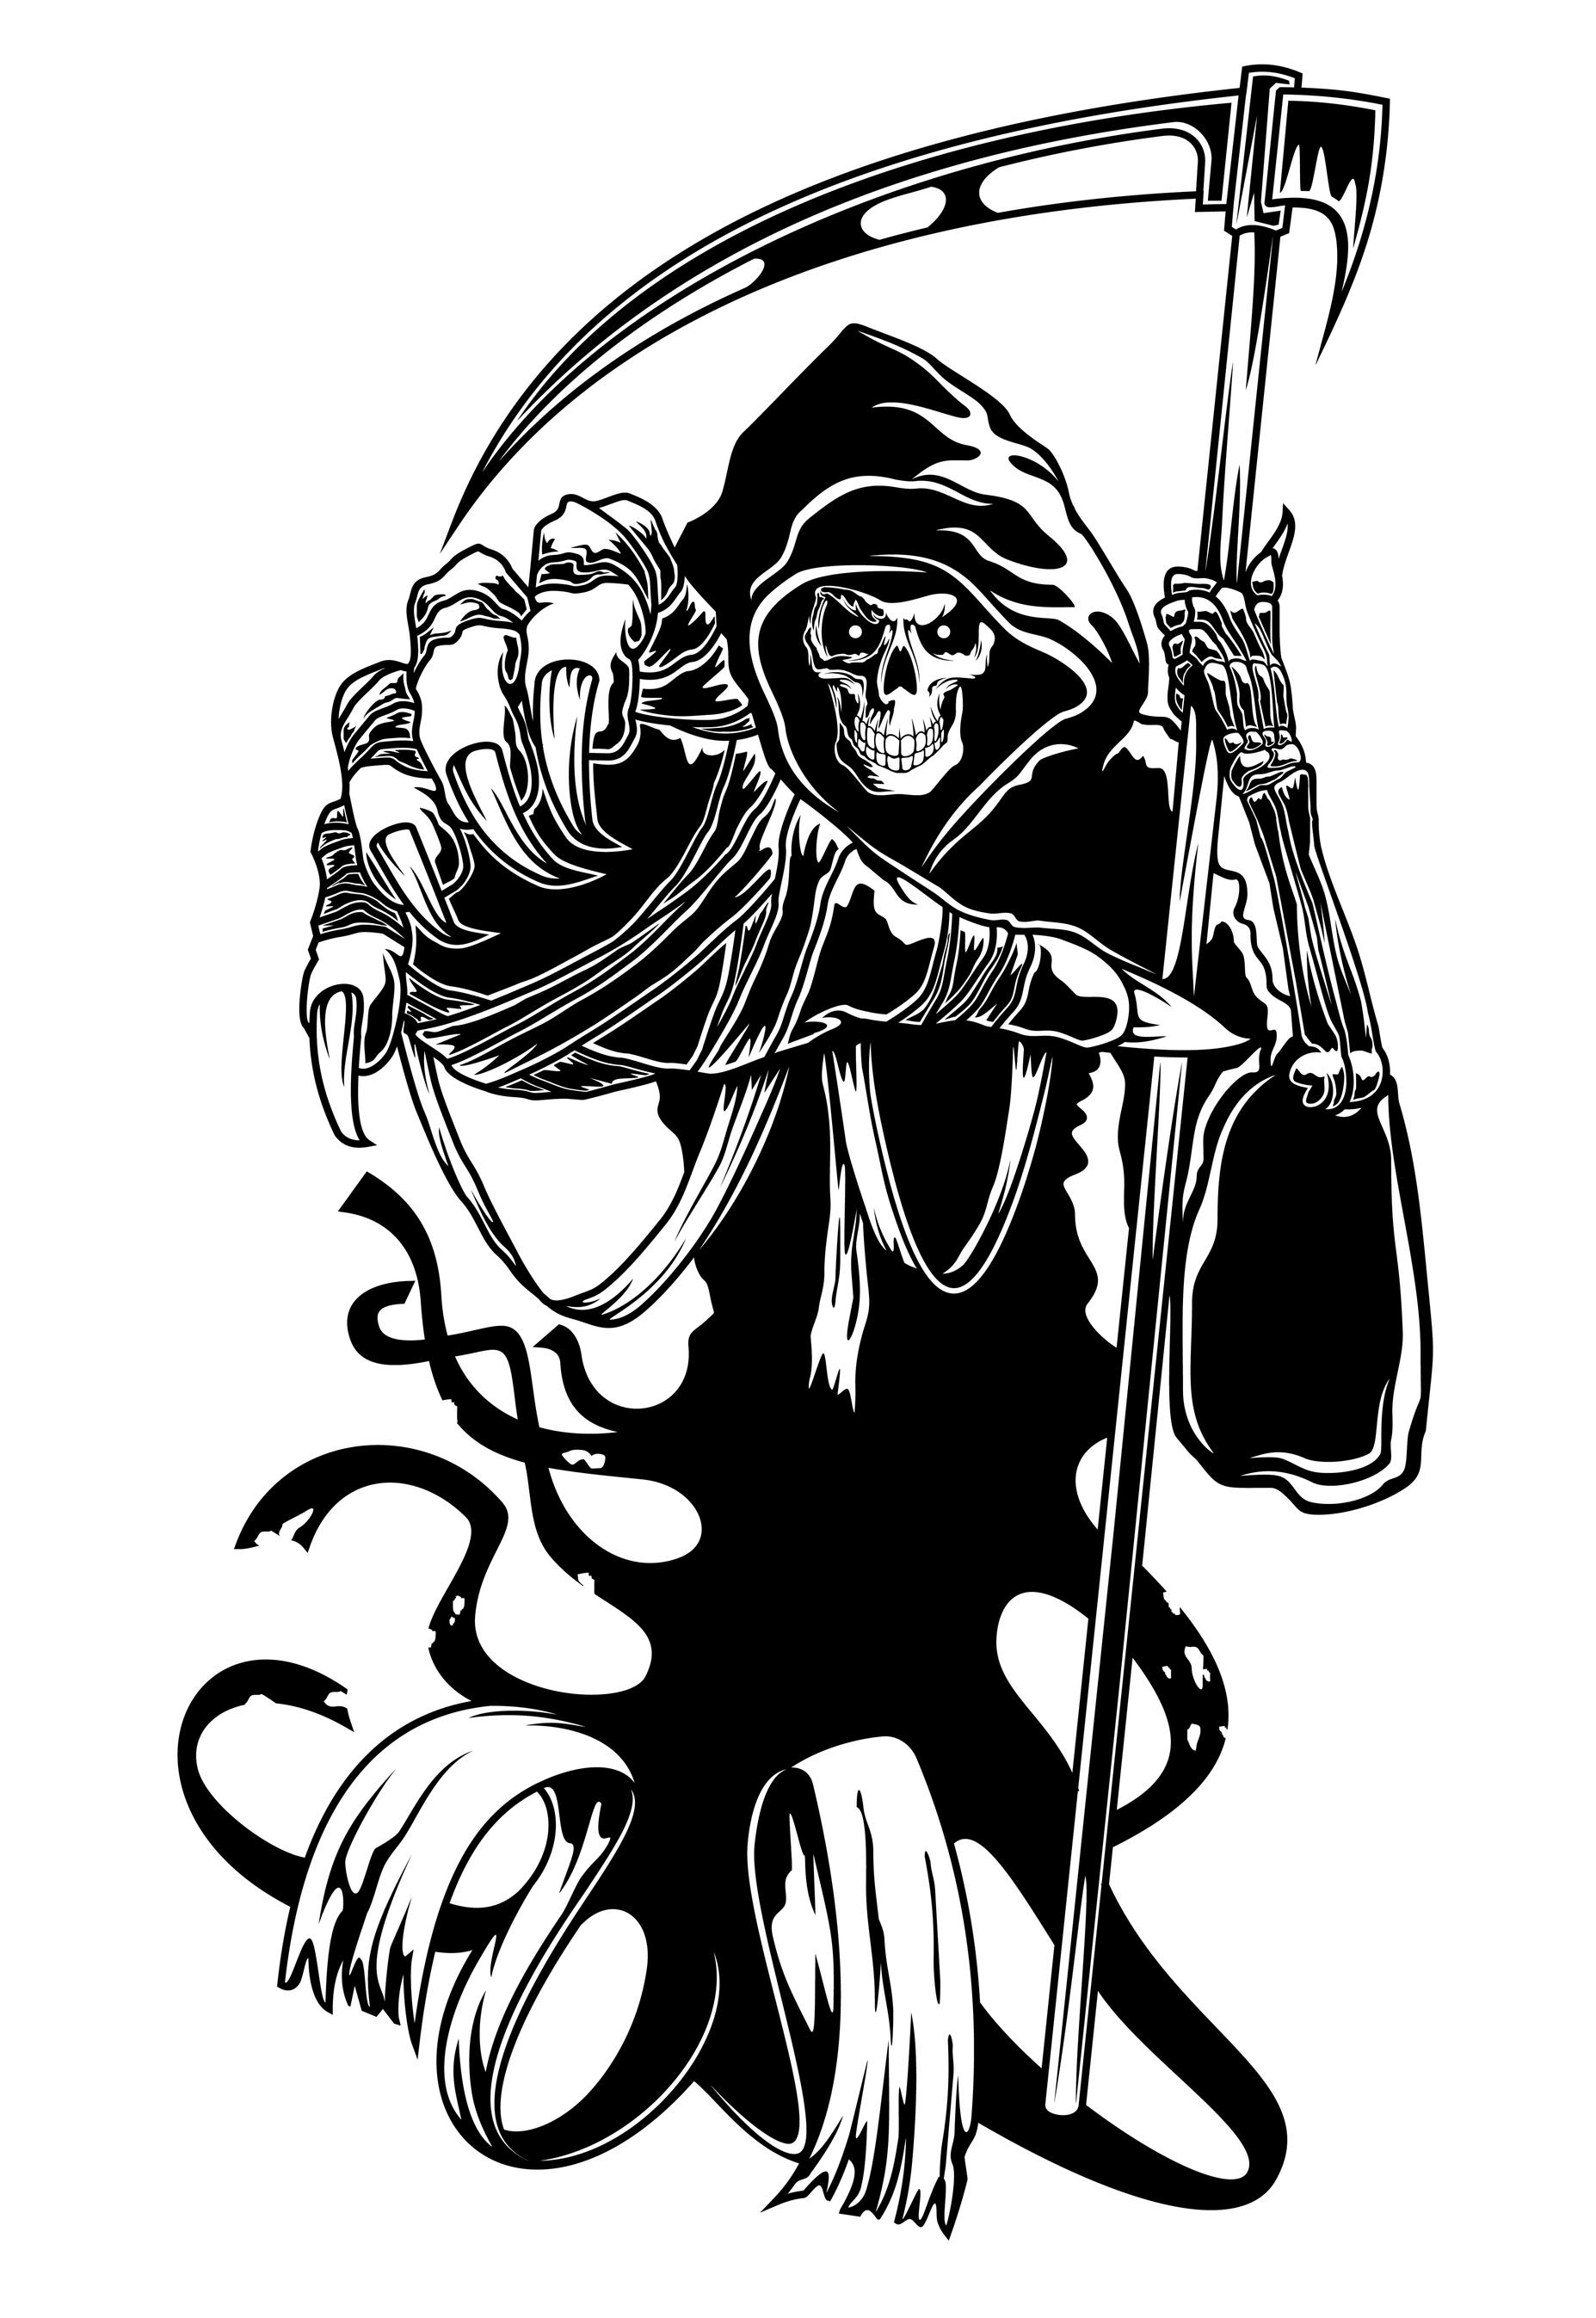 Drawn scythe tribal Vision Victory > Designs Tribal